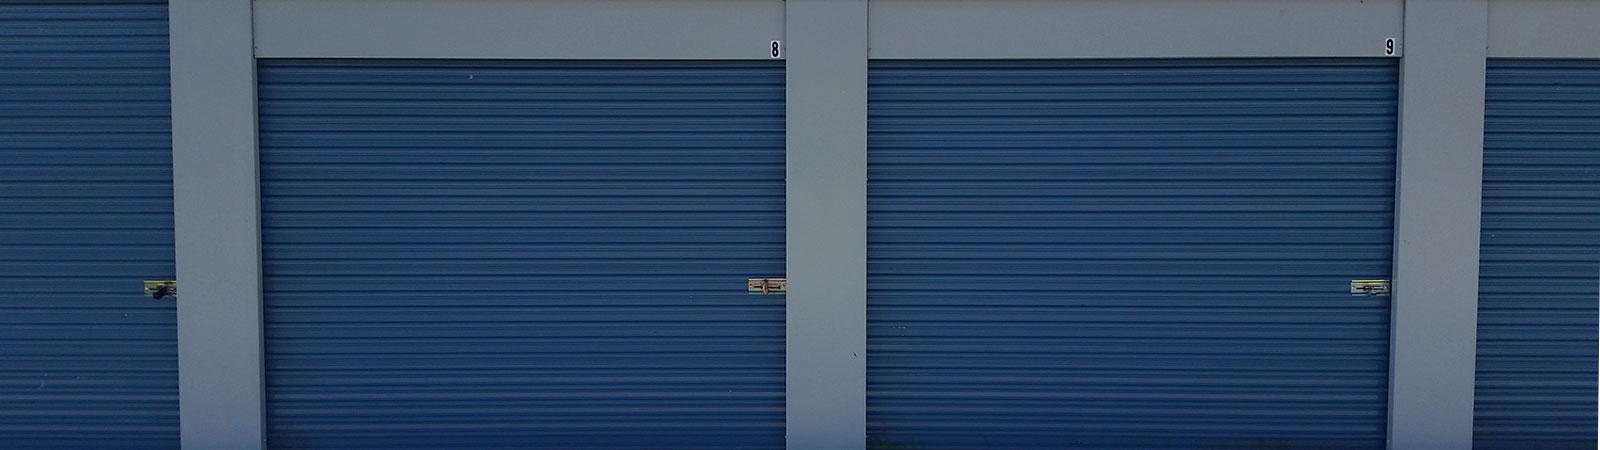 line of overhead doors on storage units